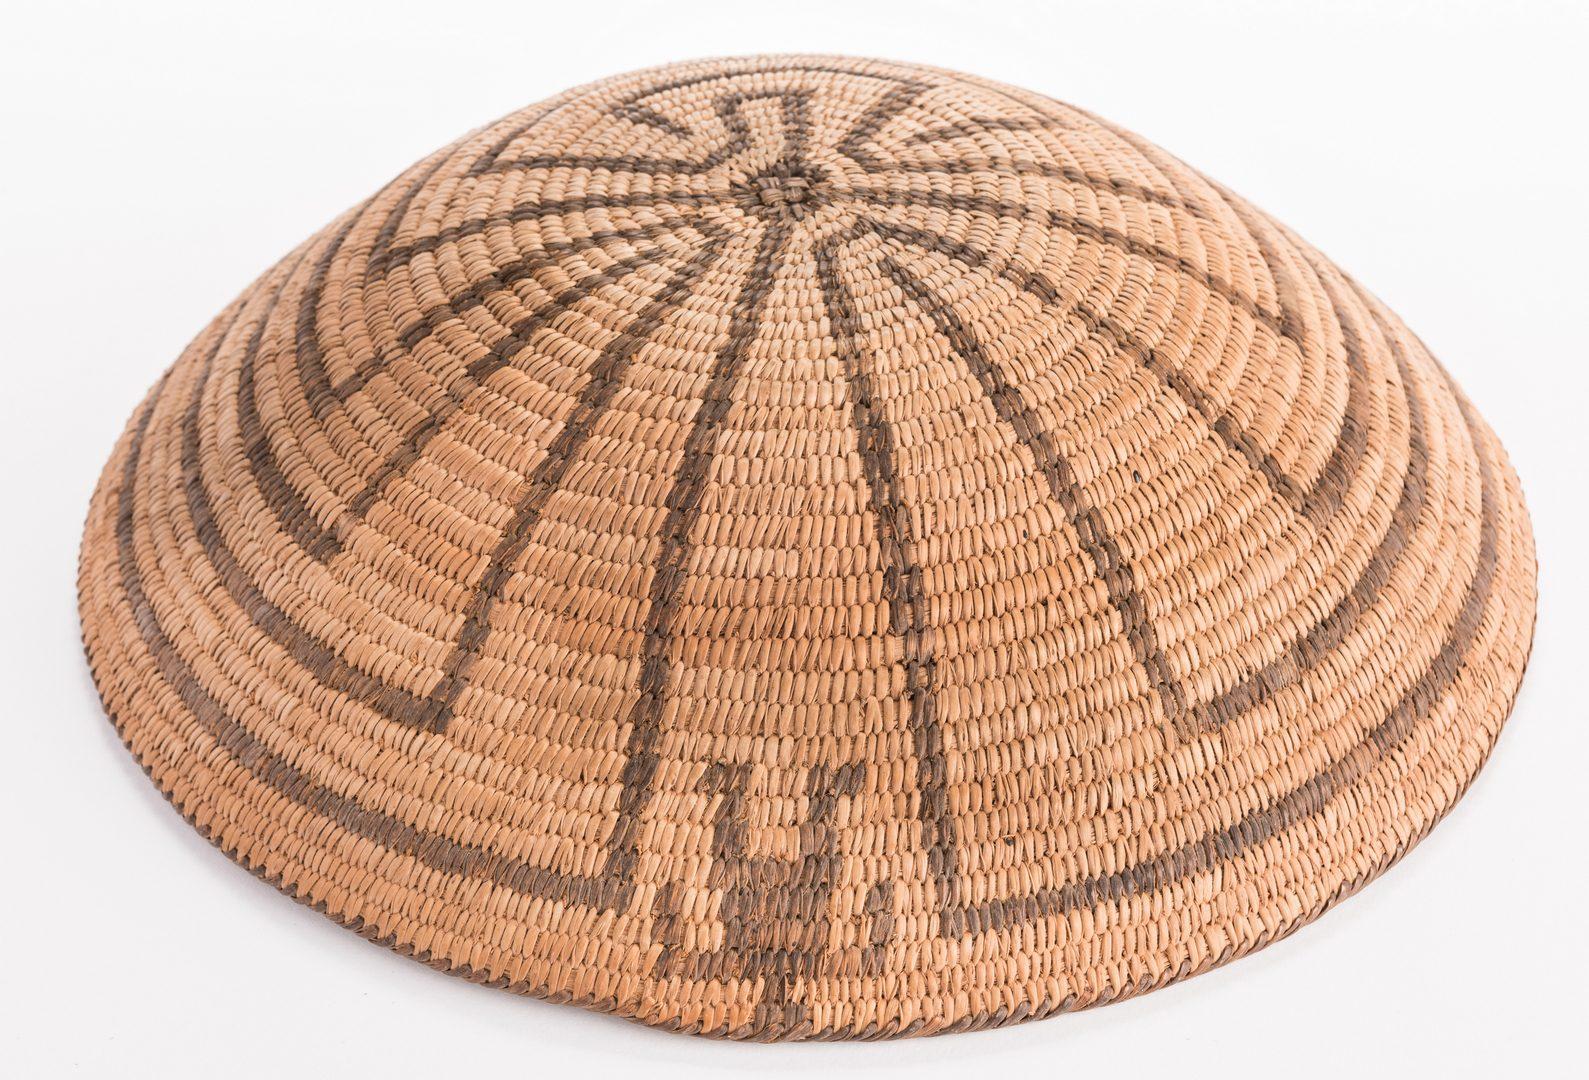 Lot 386: Pima Tray Basket, Man in the Maze Design